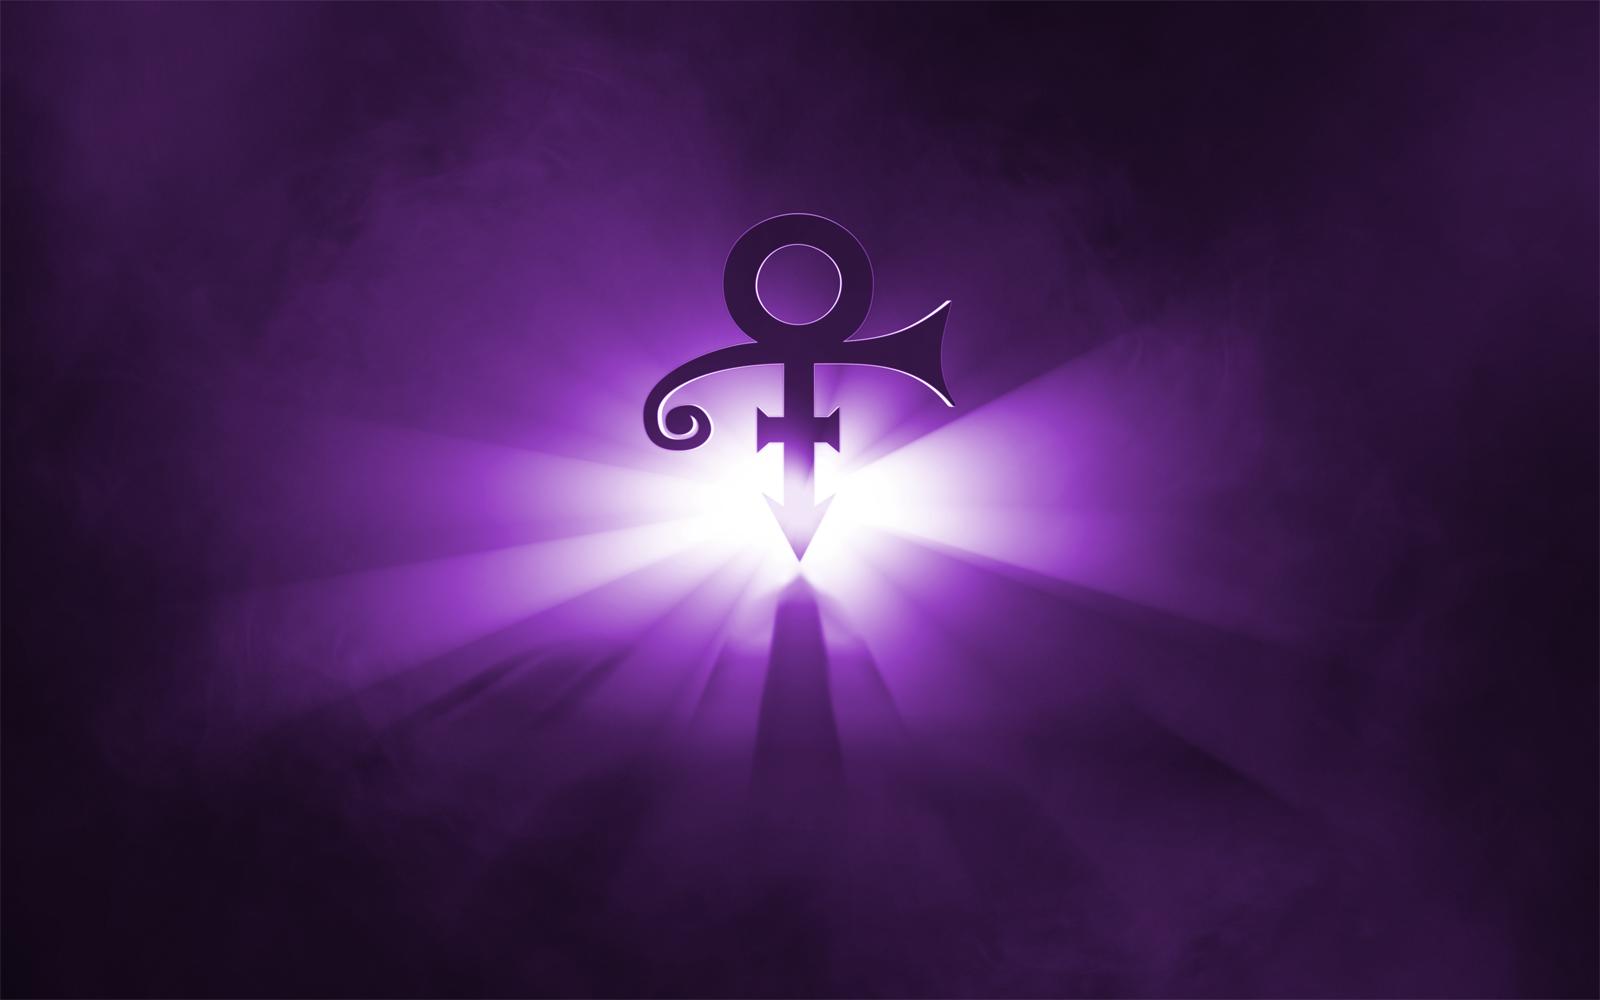 prince glowing symbol wallpaper by fearoftheblackwolf on